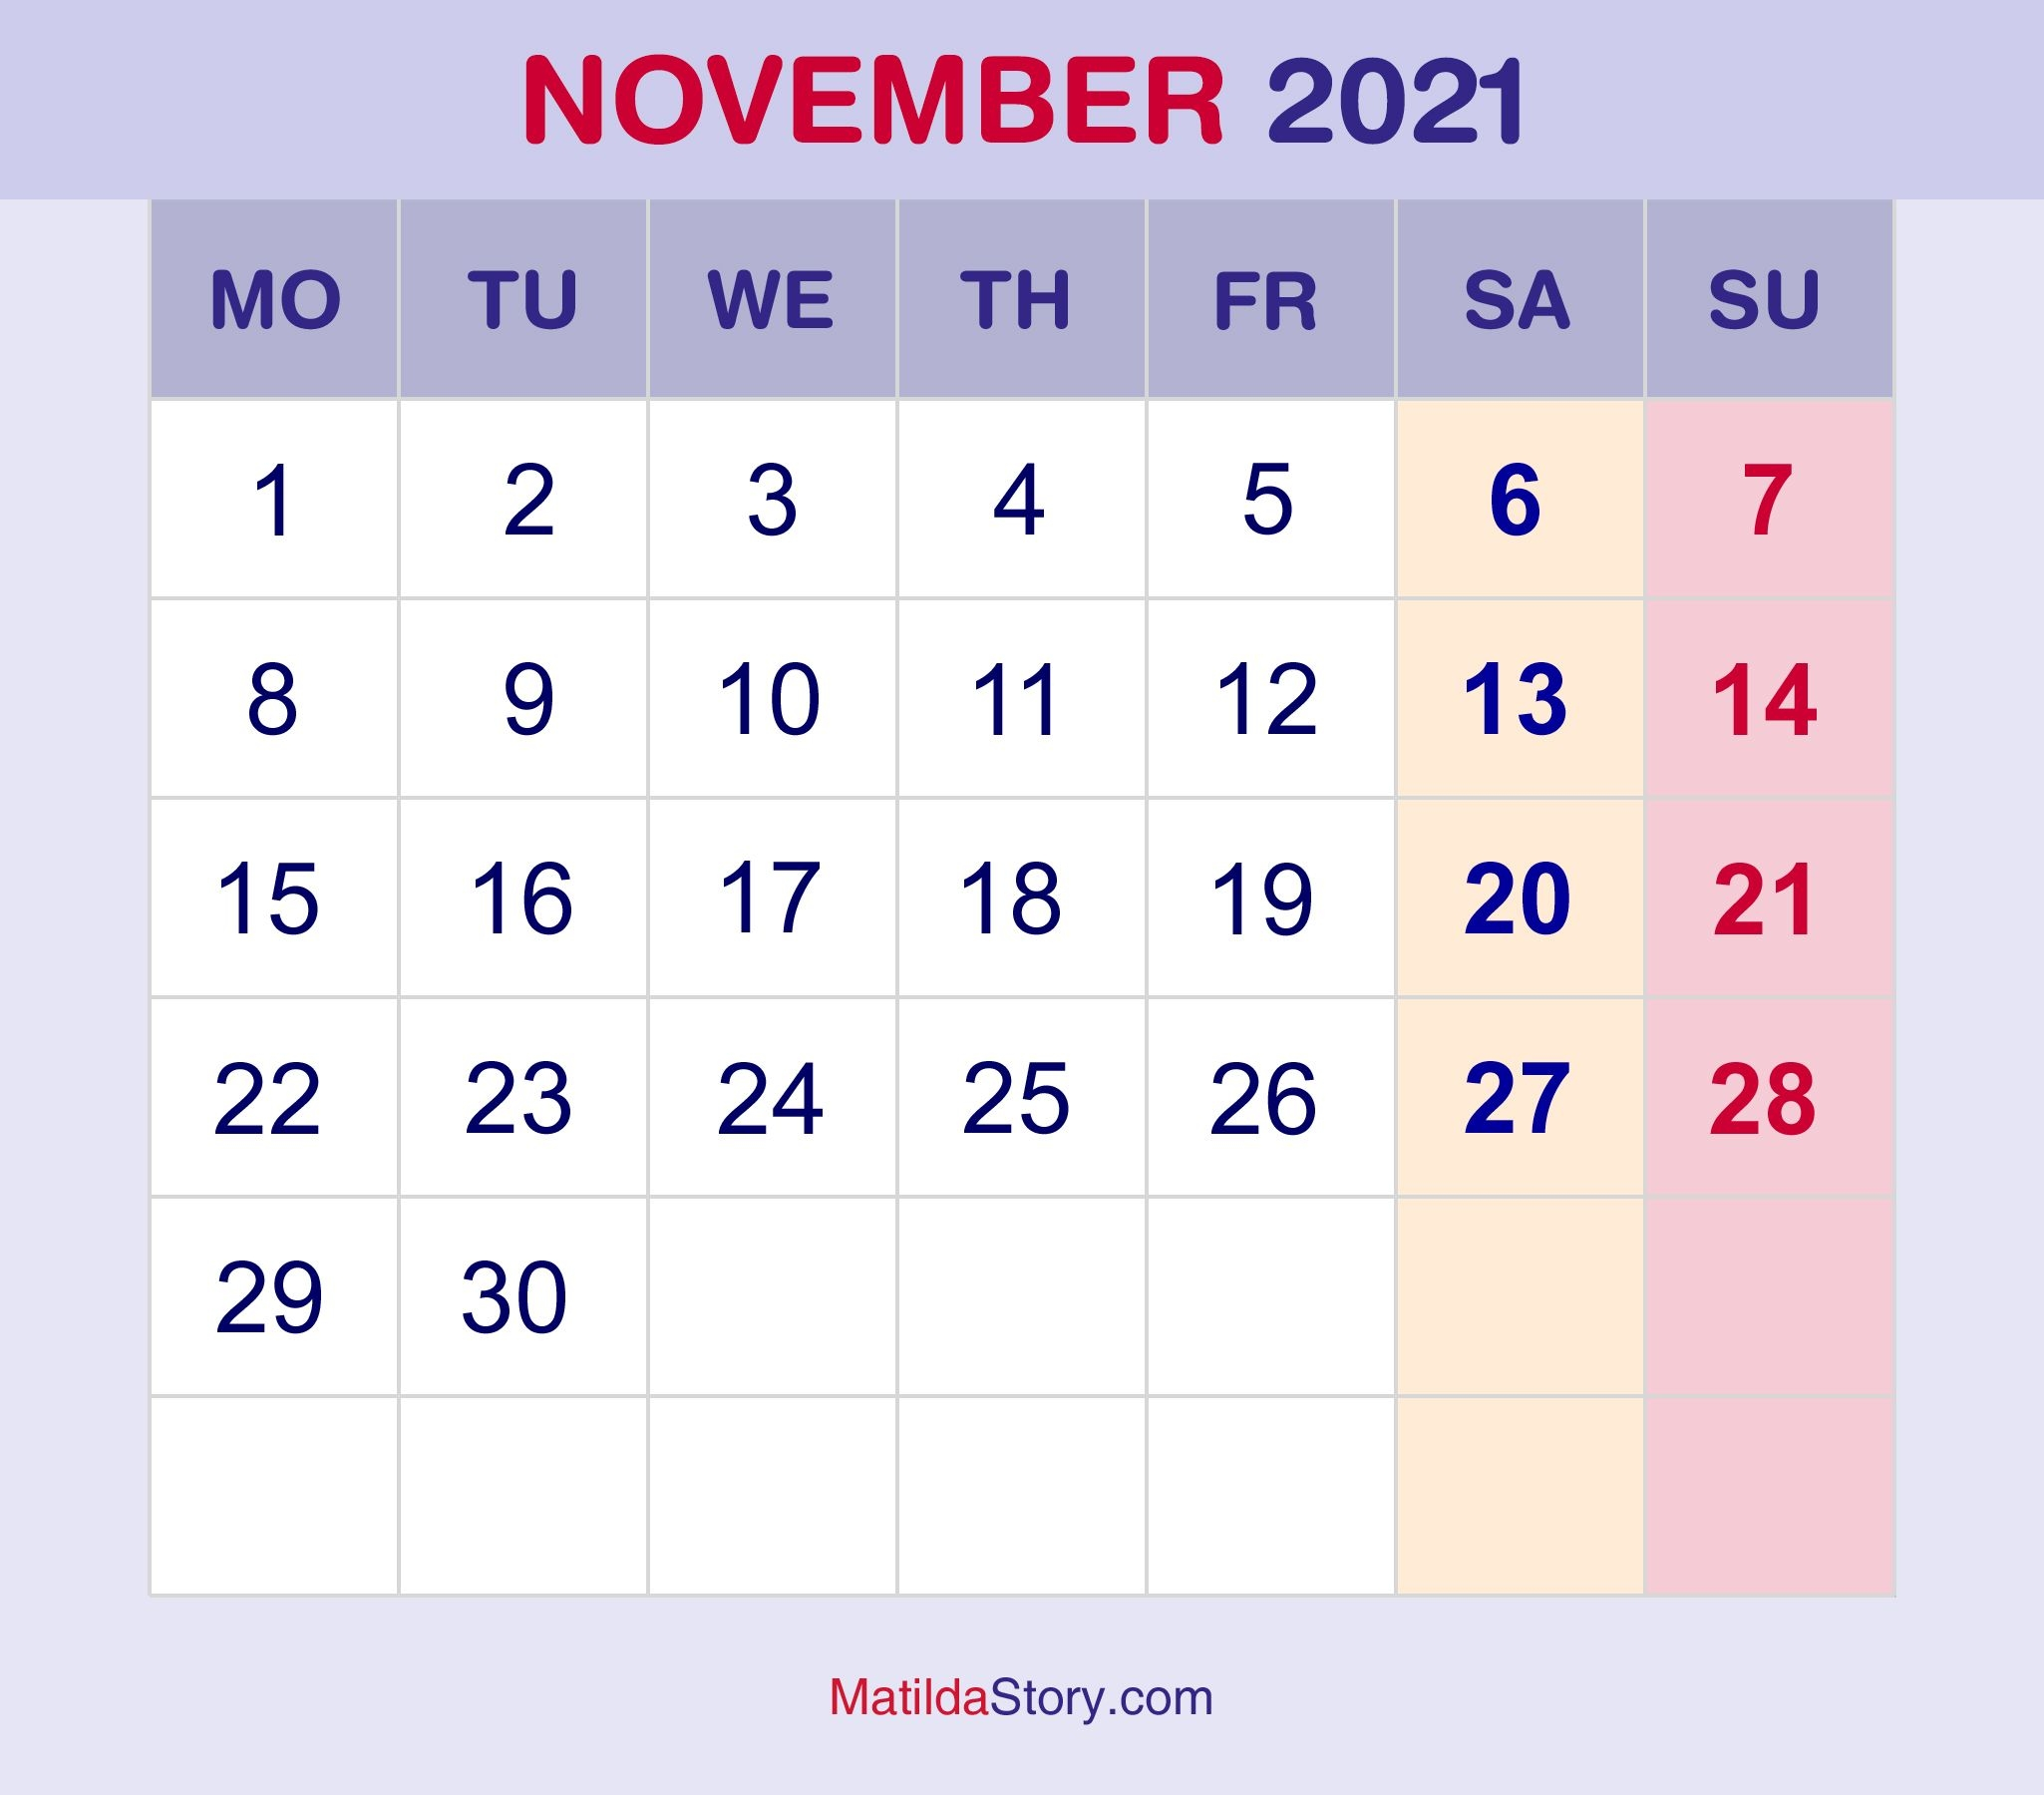 November 2021 Monthly Calendar, Monthly Planner, Printable